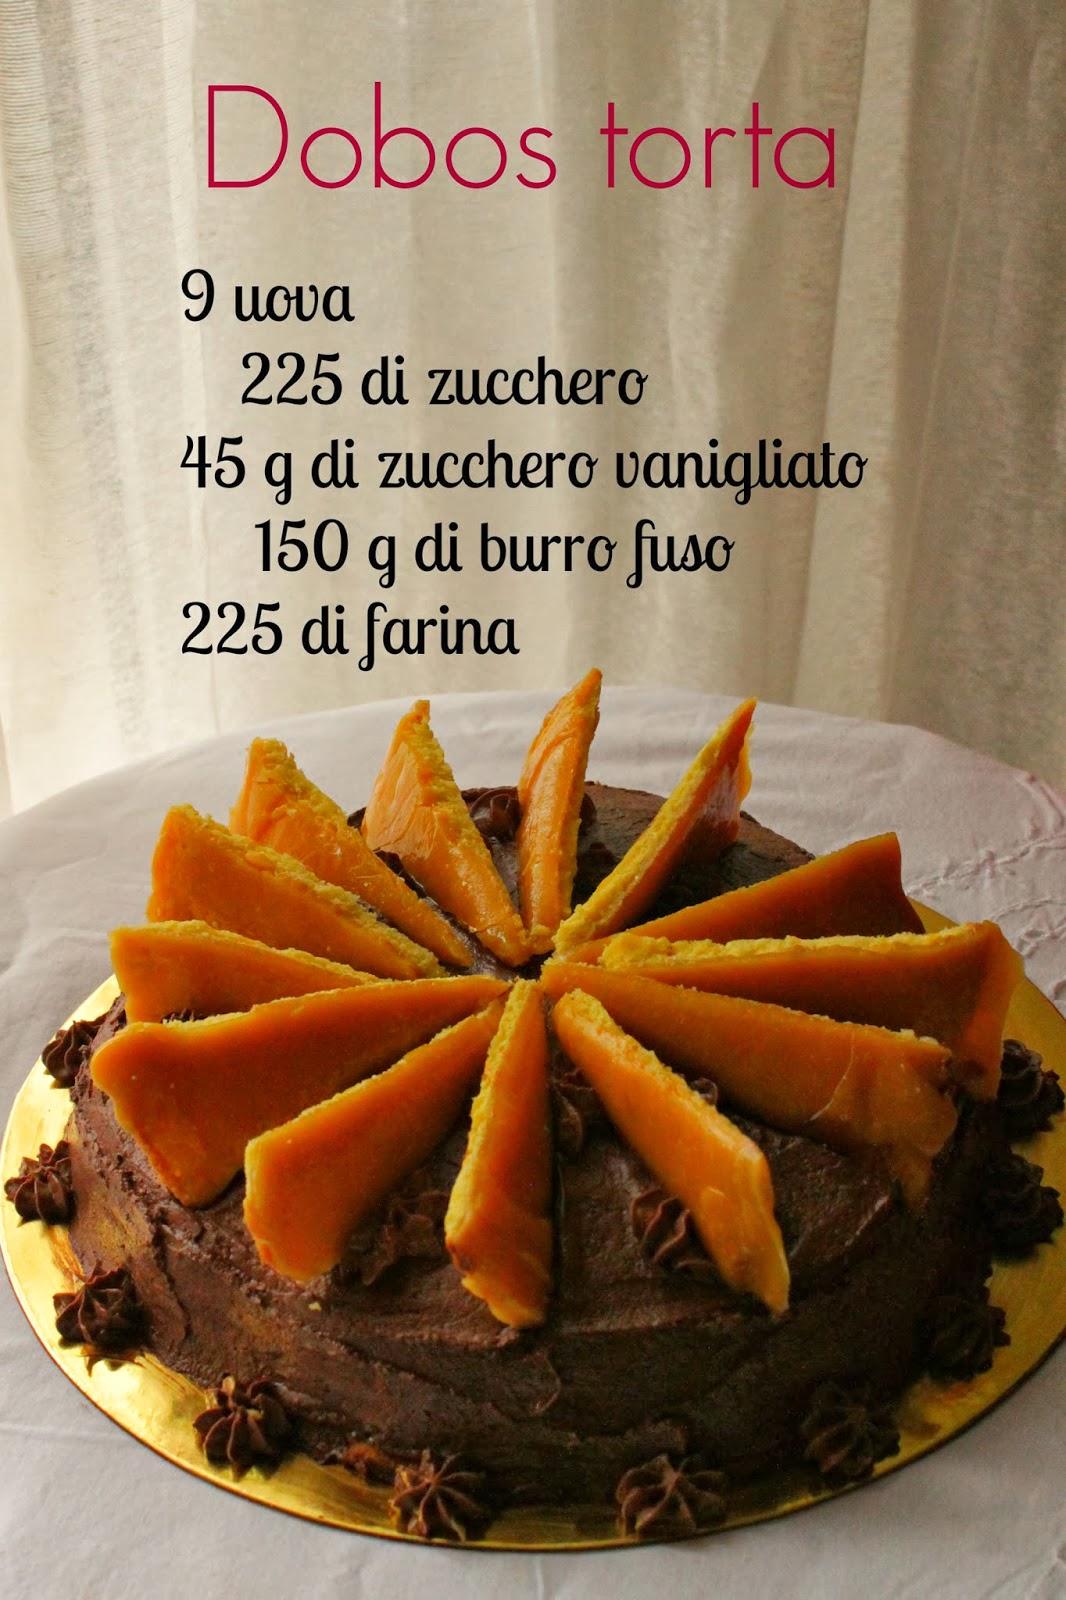 doboš torta: il dolce ungherese più famoso!